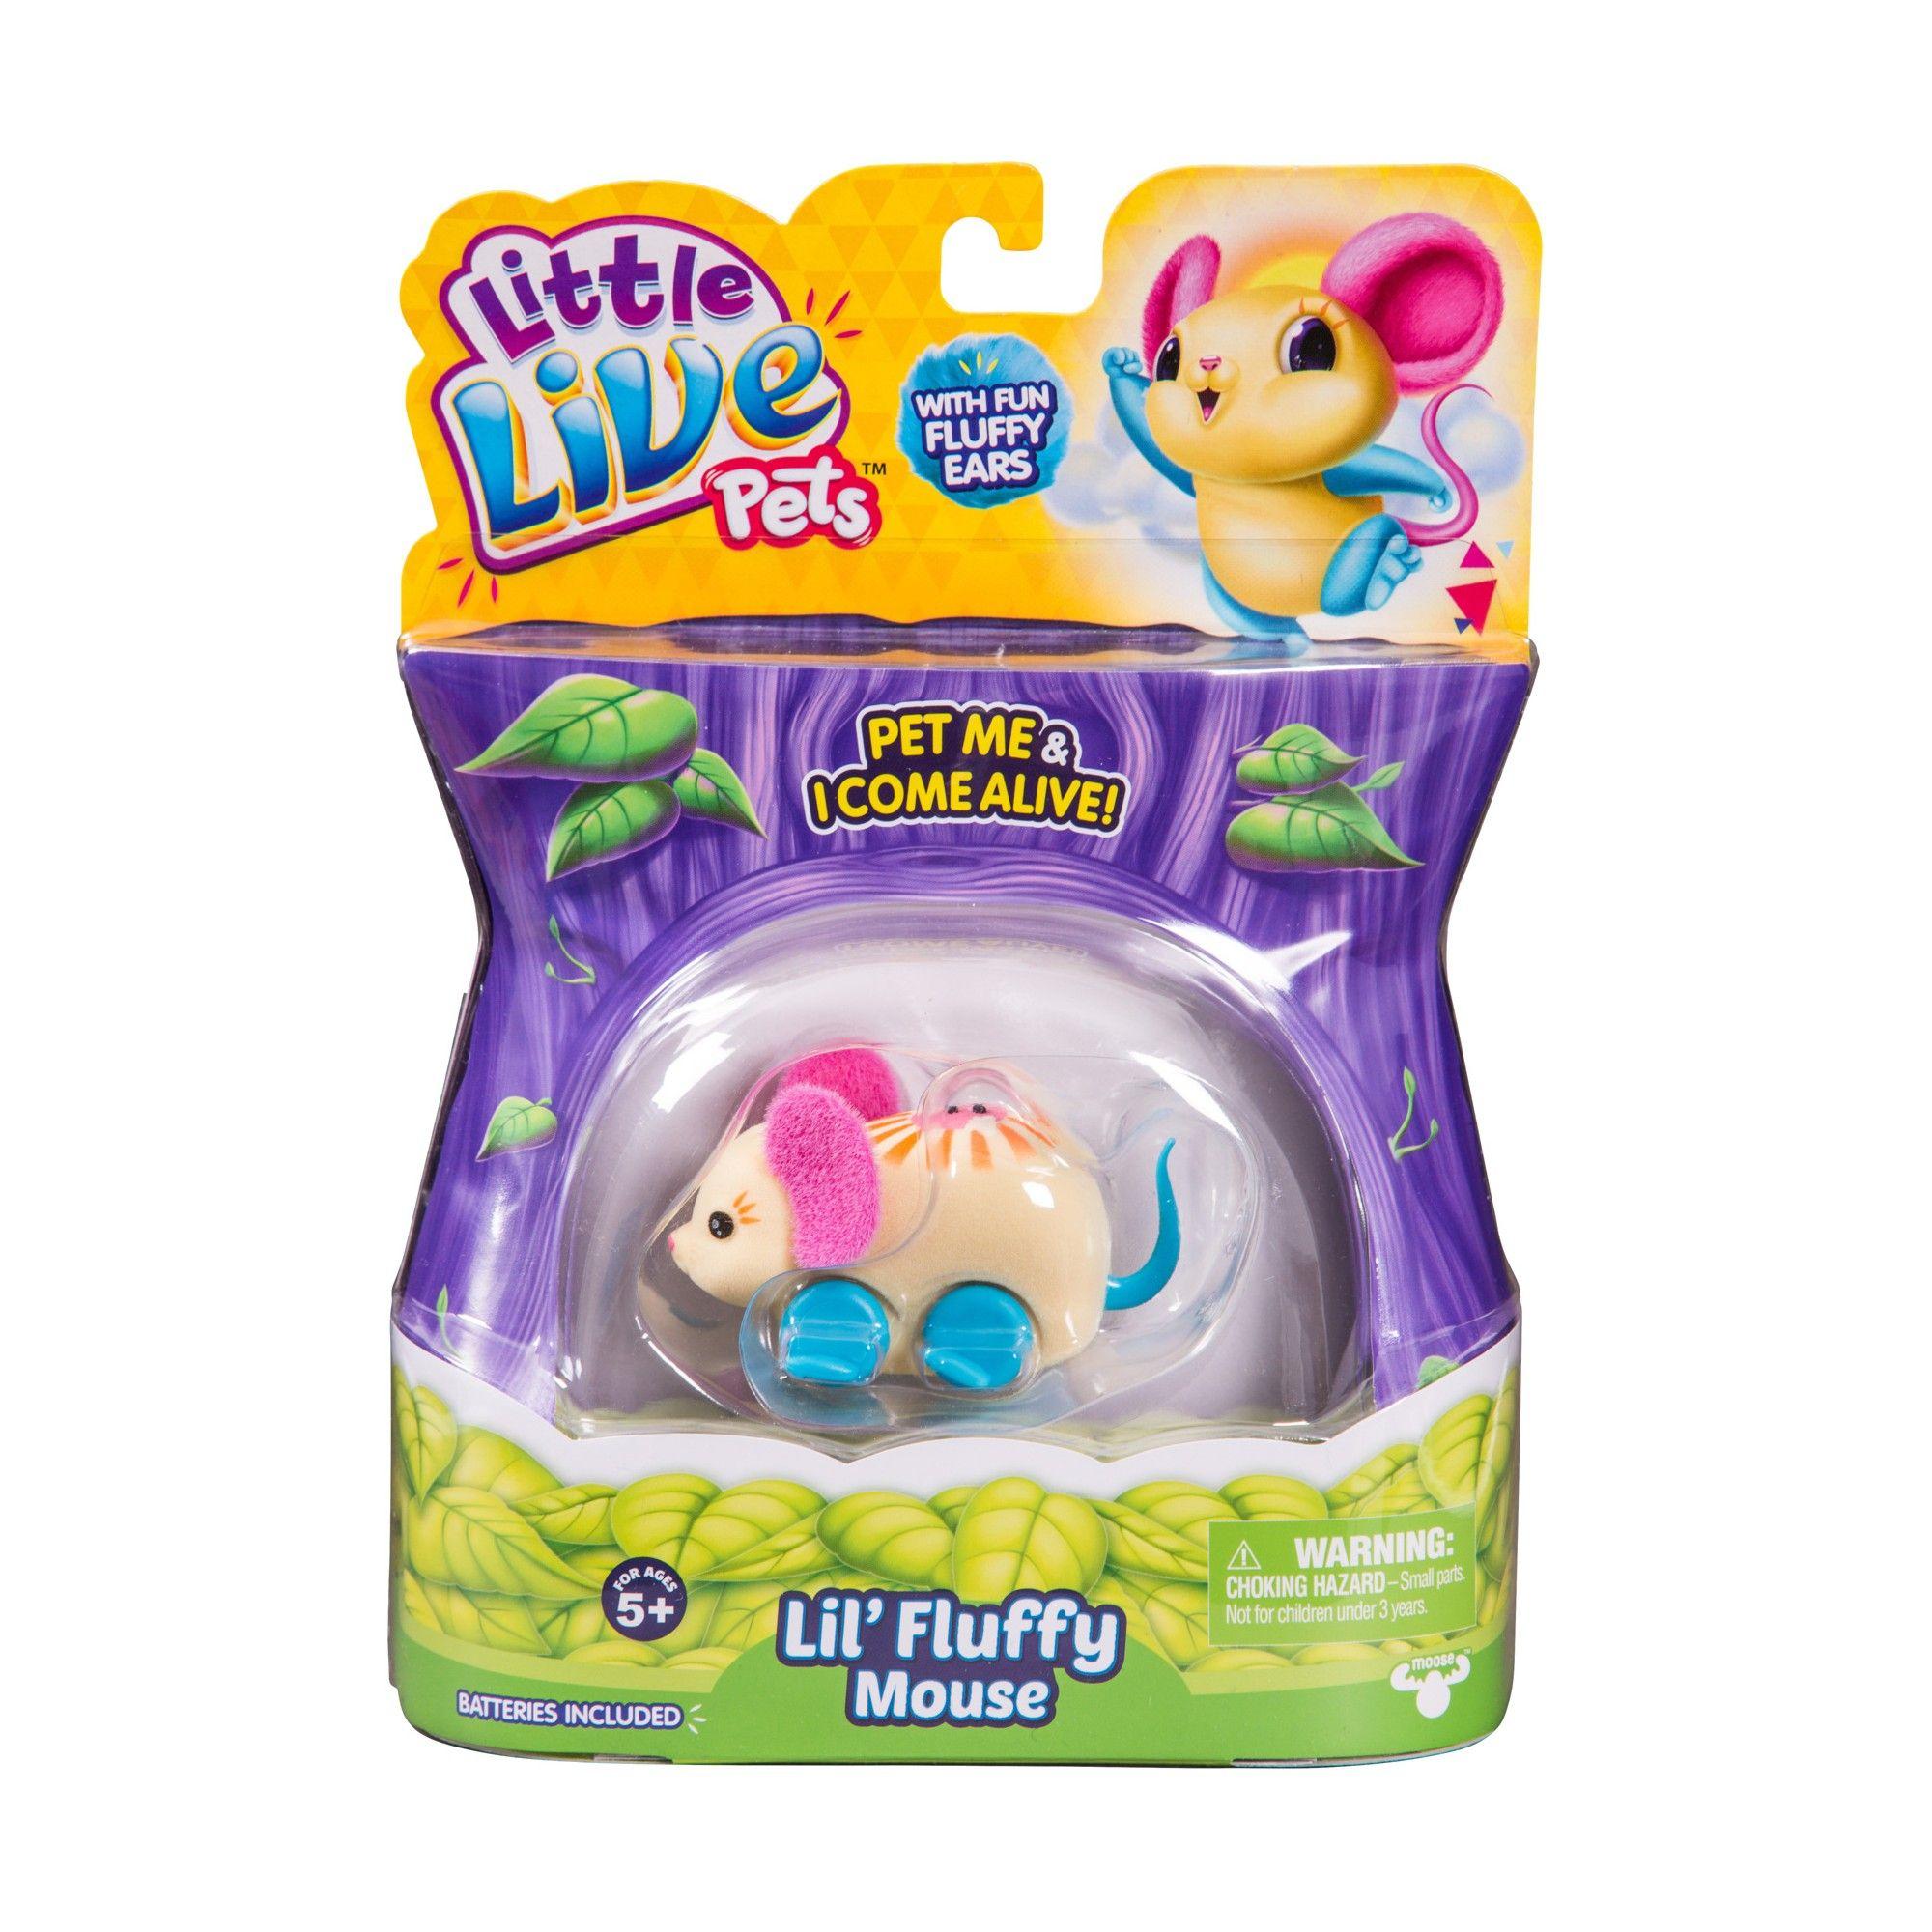 Little Live Pets Season 2 Single Pack Mouse Little Twinkle Top Reviews Little Live Pets Cute Stuffed Animals Pet Mice